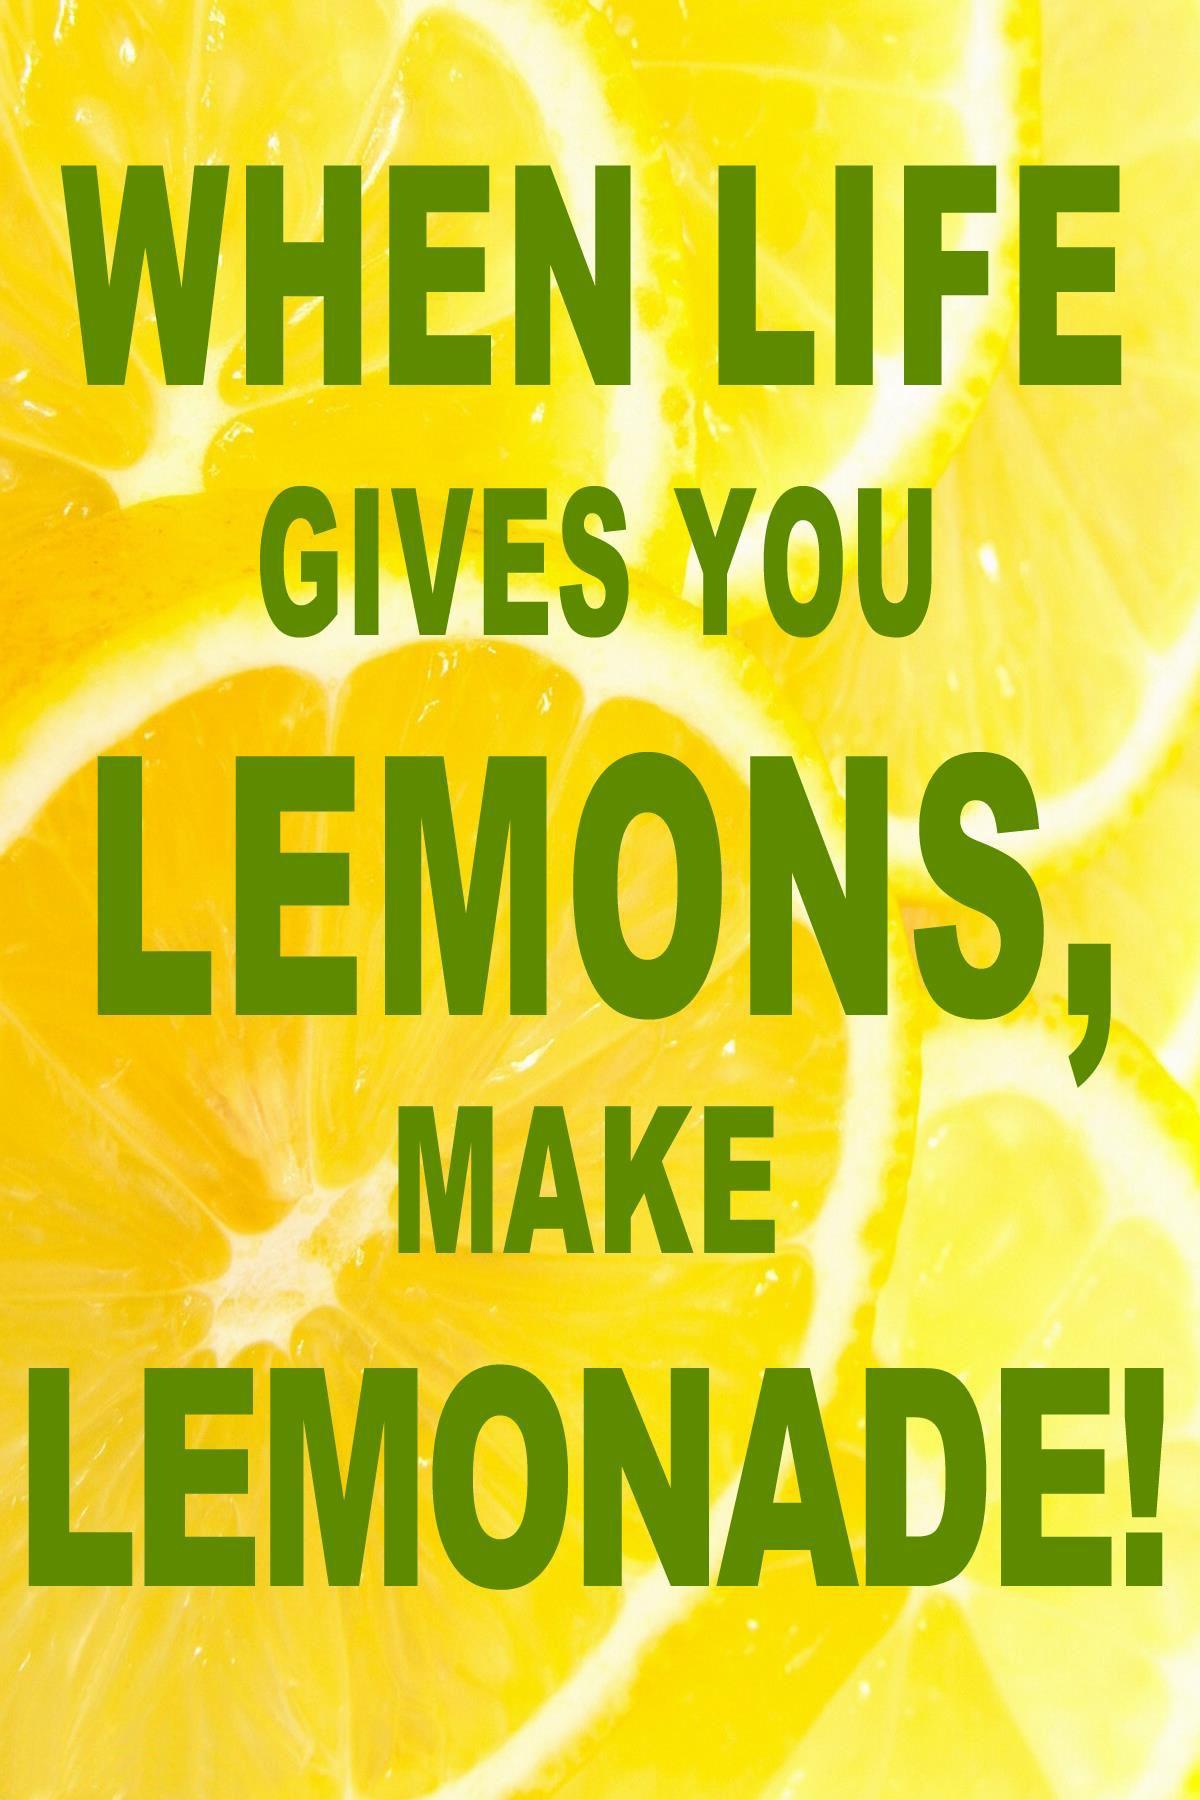 lemonade quotes quotesgram. Black Bedroom Furniture Sets. Home Design Ideas